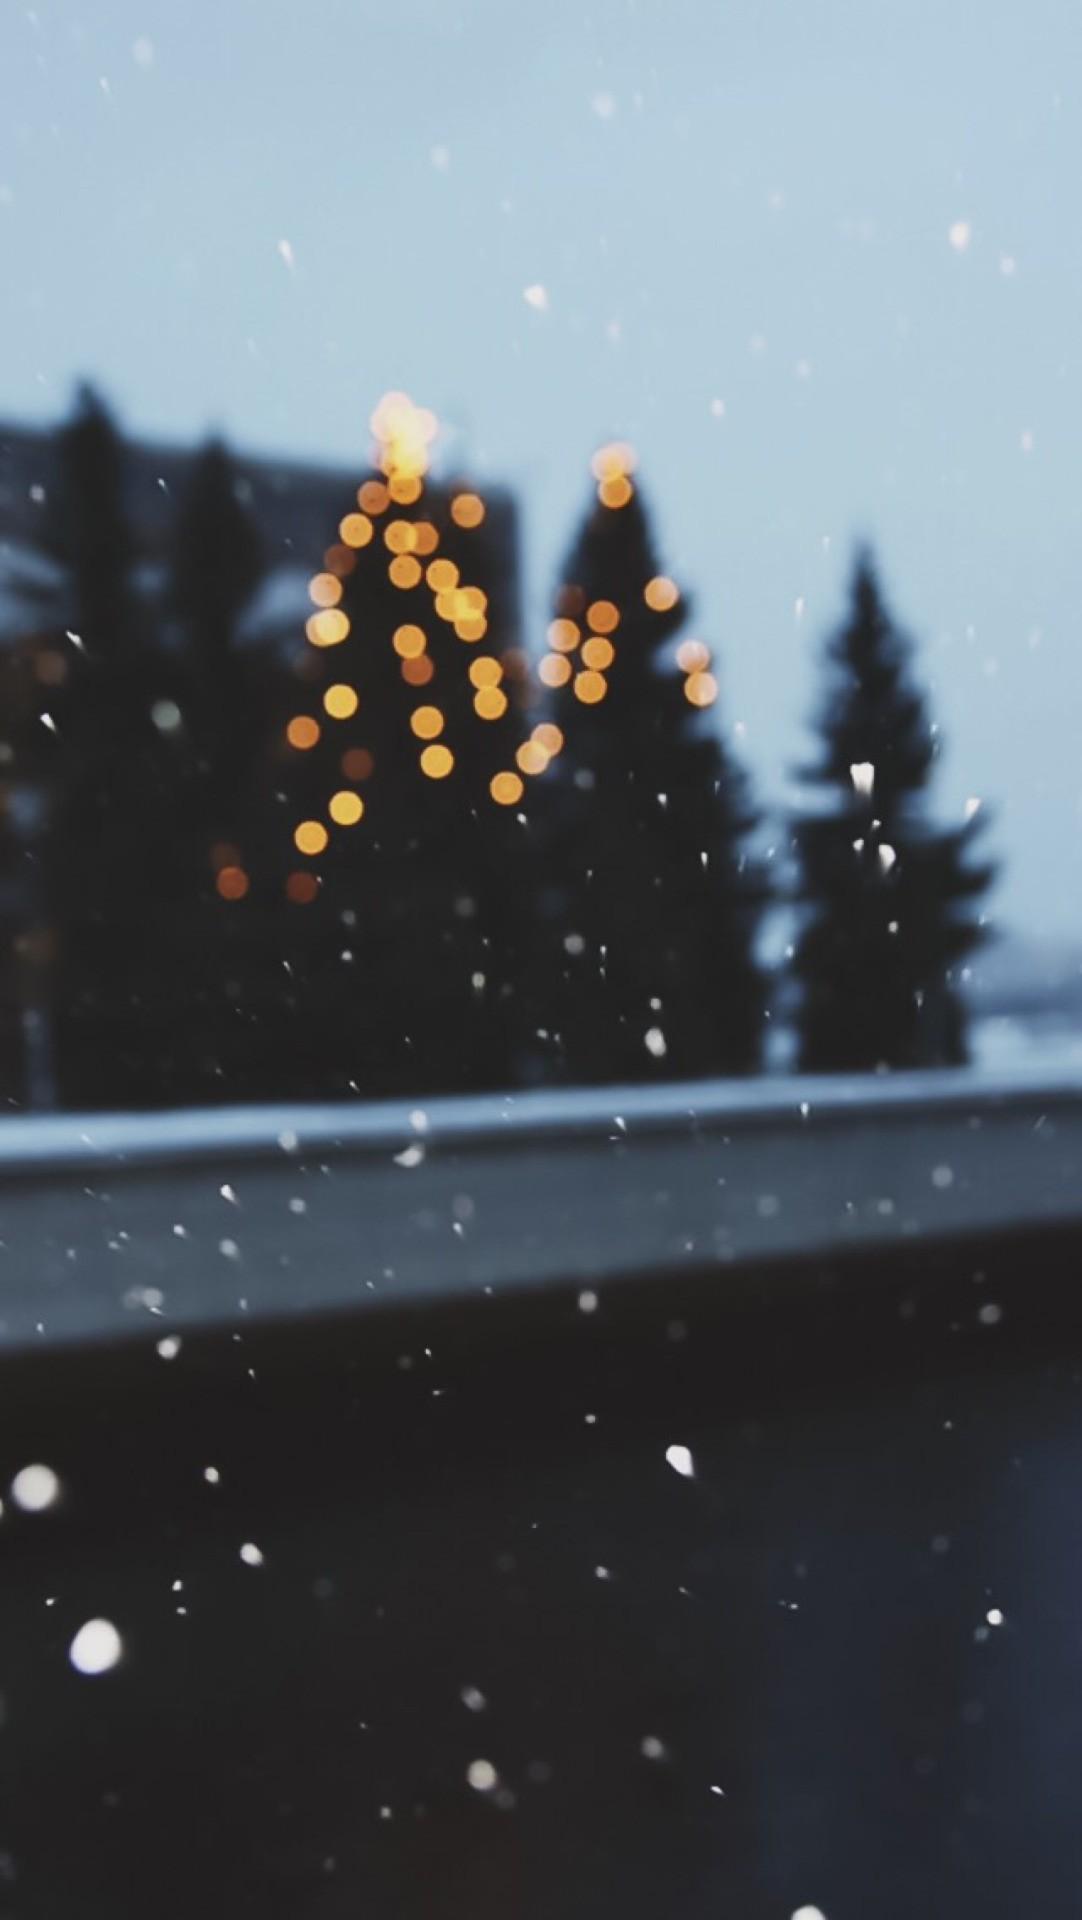 Christmas wallpaper Tumblr ·① Download free amazing ... Christmas Tumblr